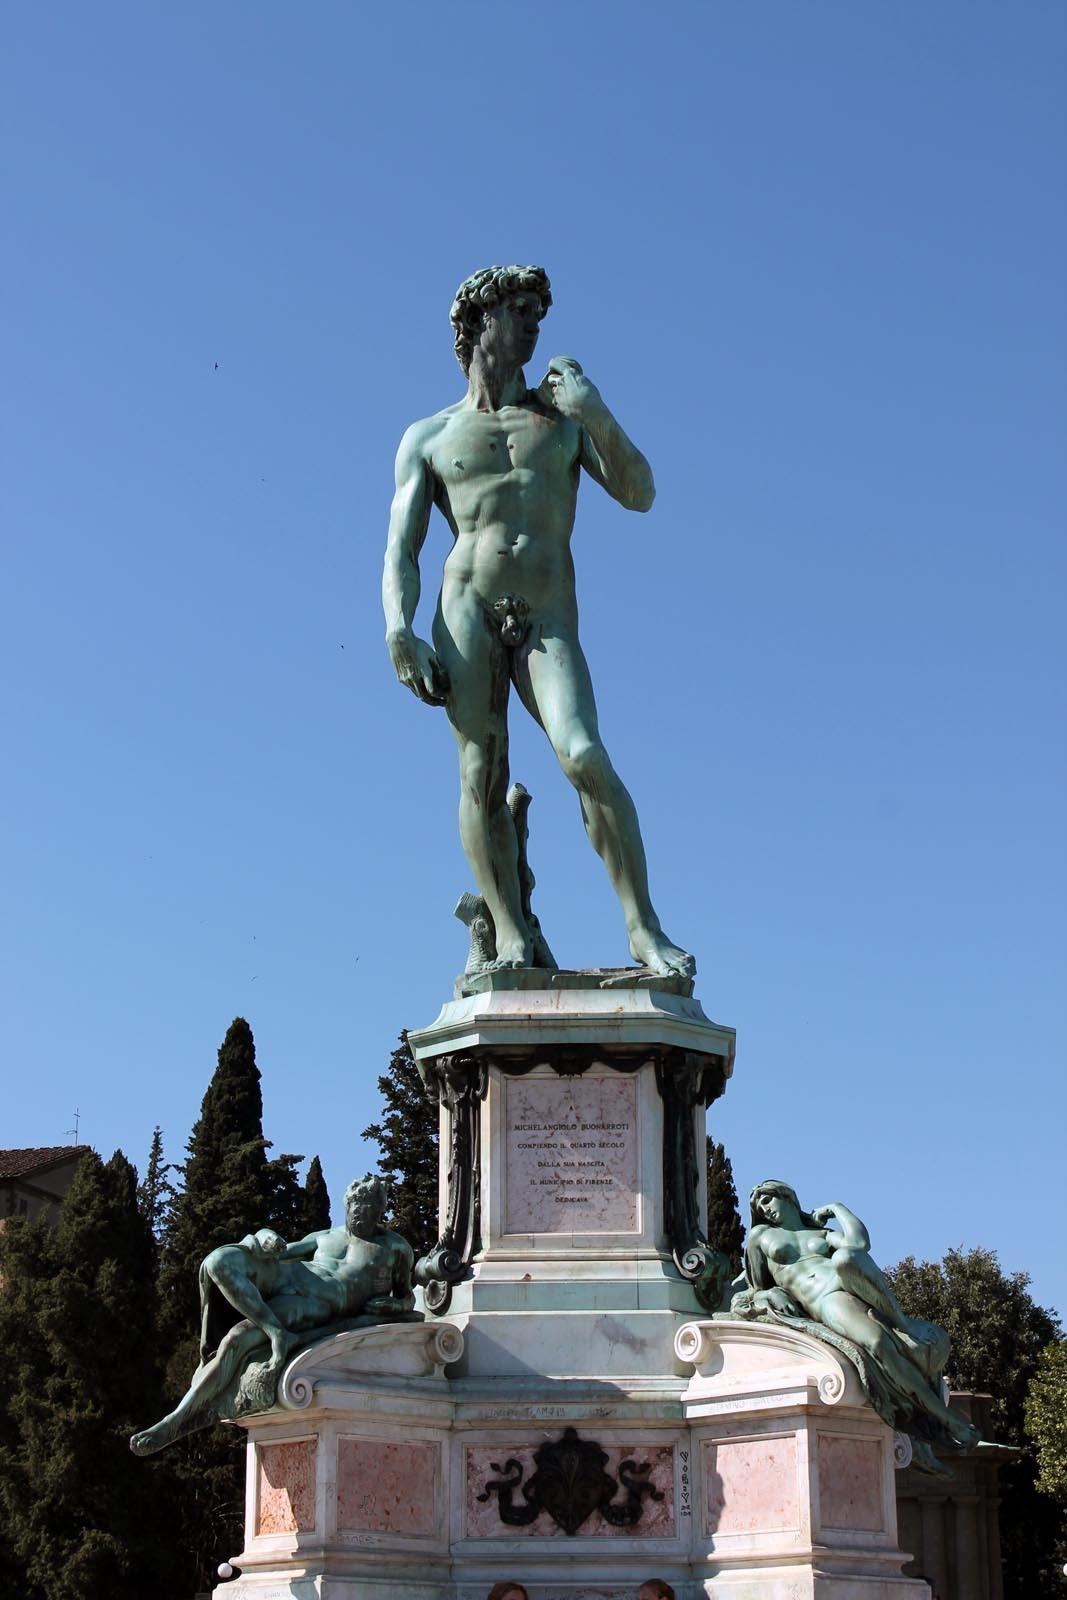 Statuia lui David domina Piazzalle Michelangelo